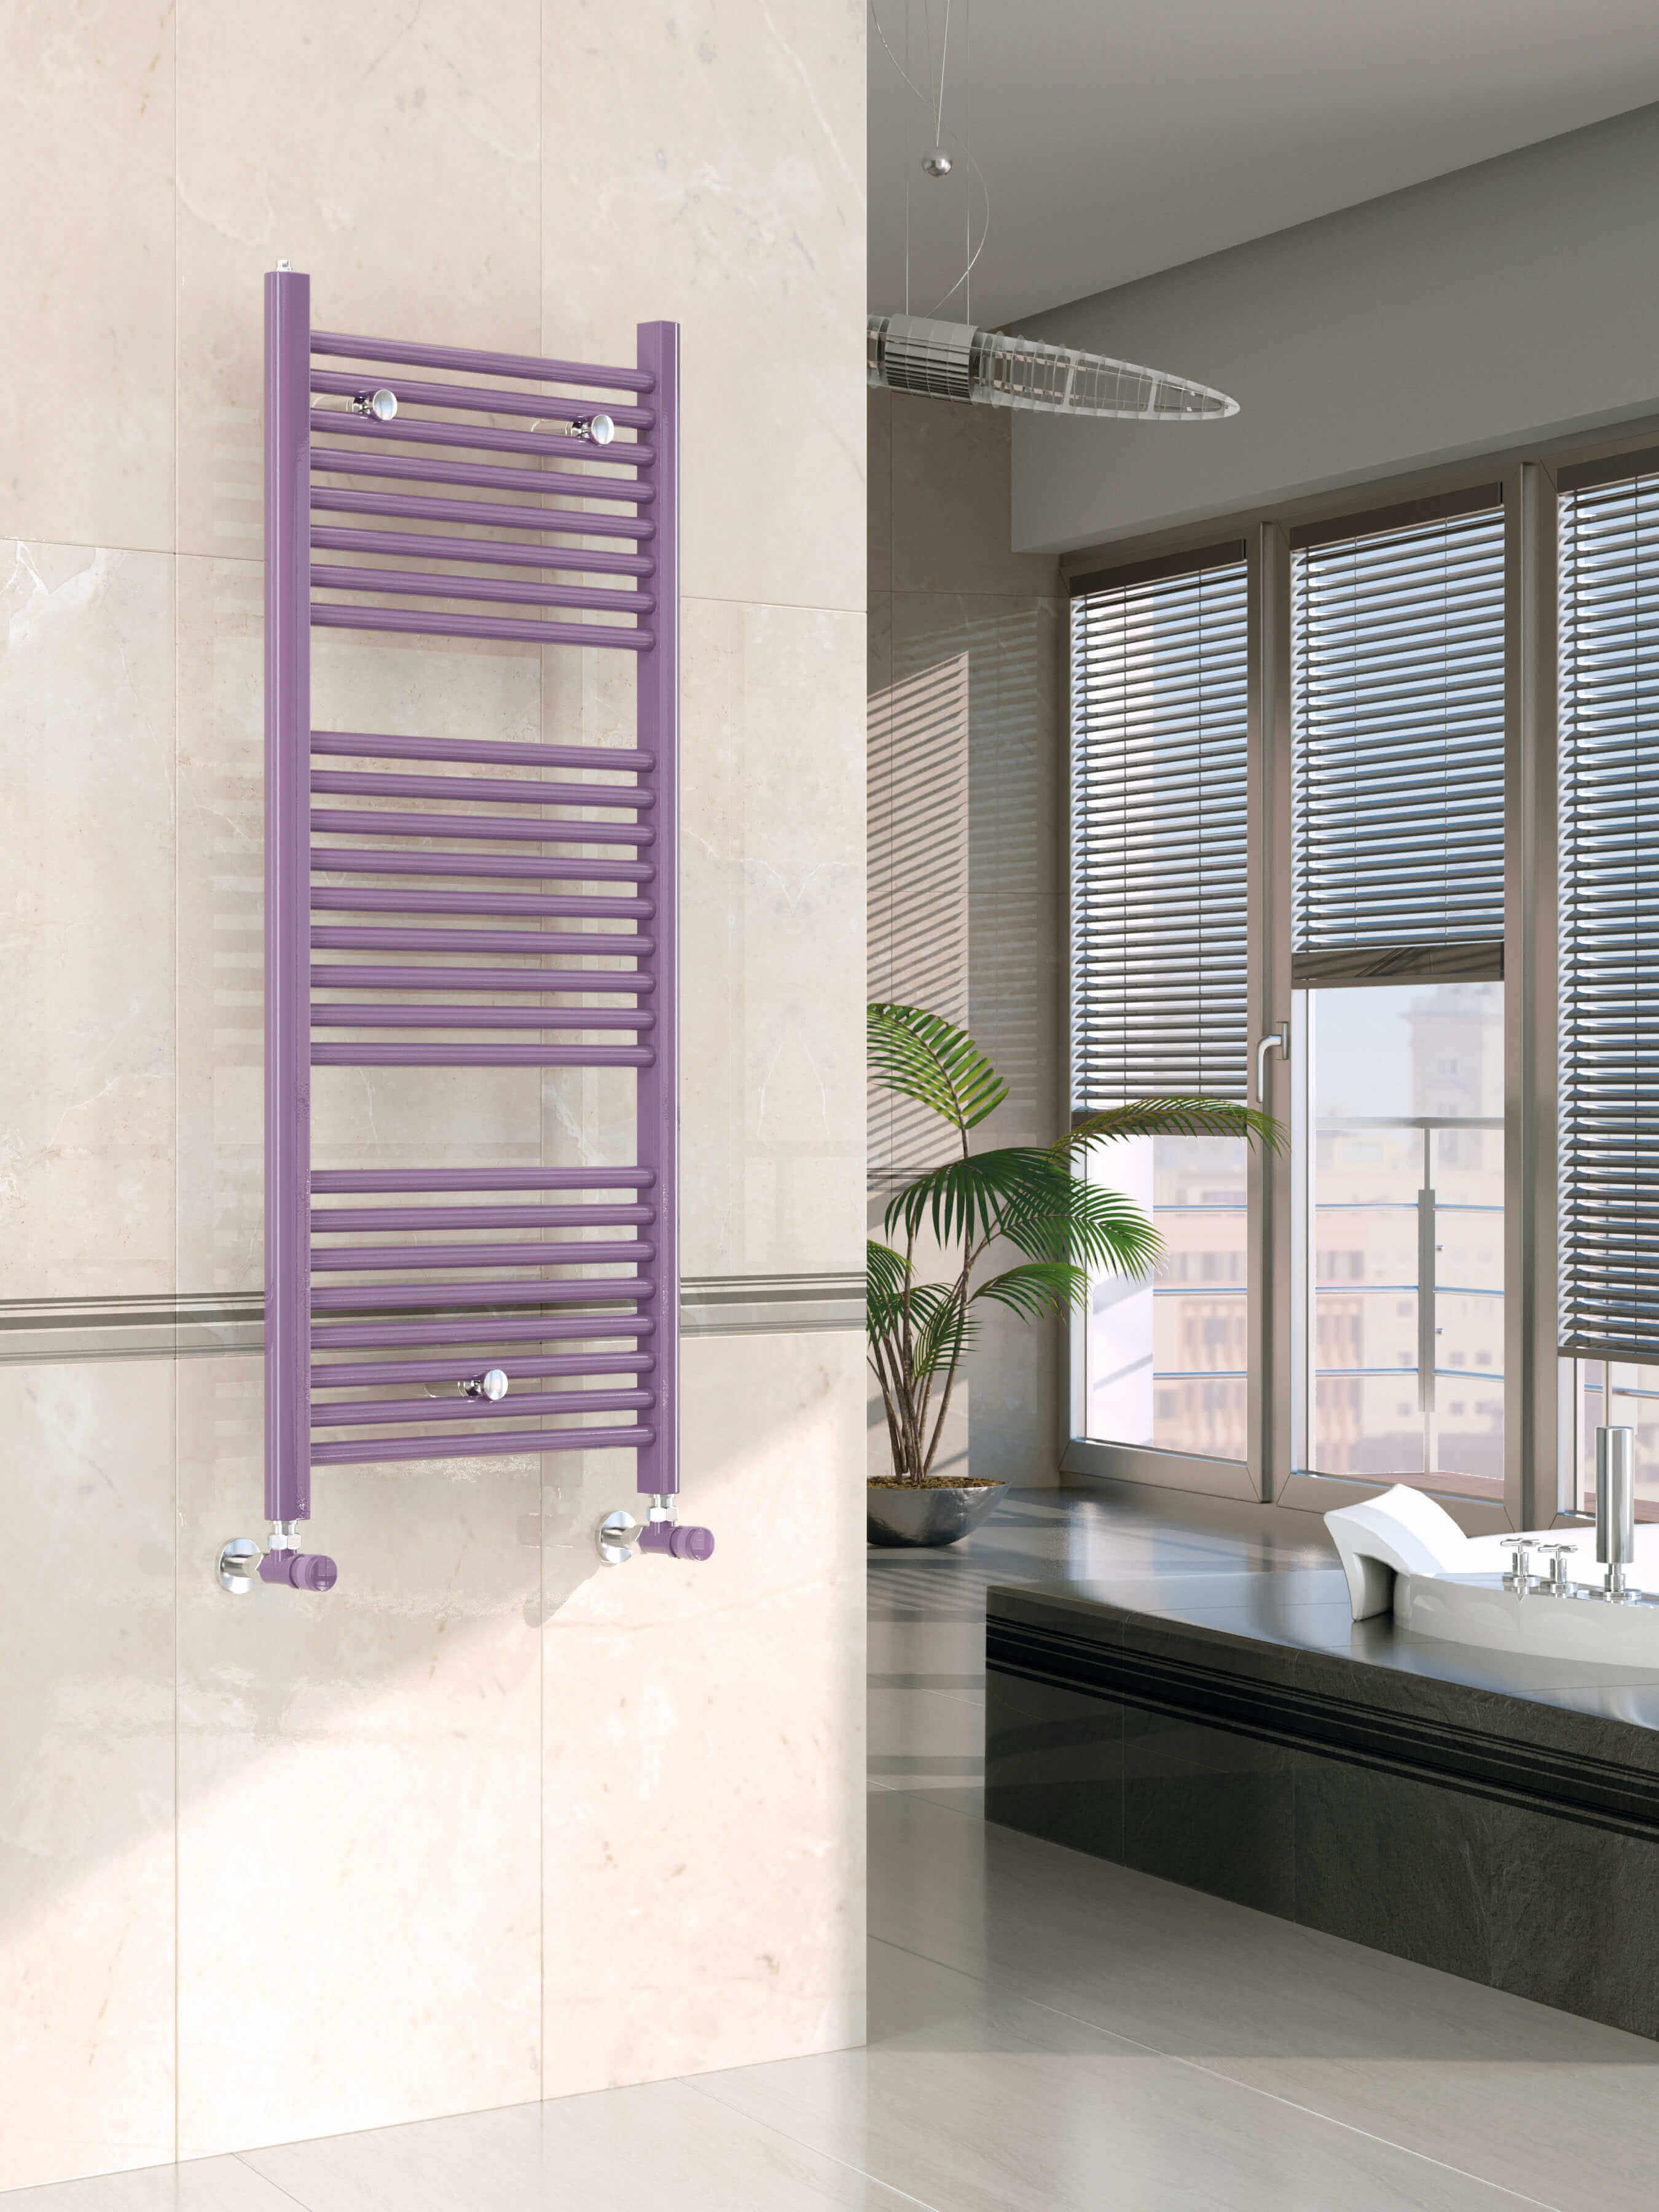 scirocco-h-laguna-towel-heater